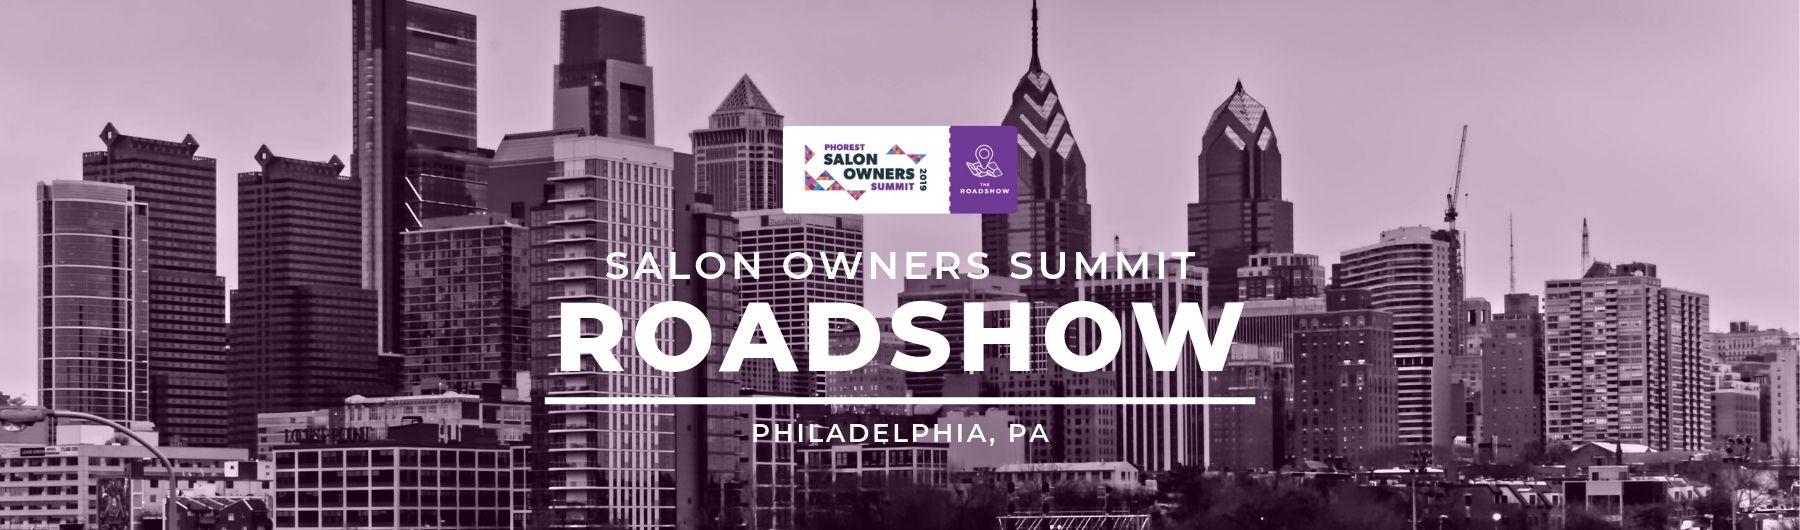 Salon Owners Summit Roadshow, Philadelphia